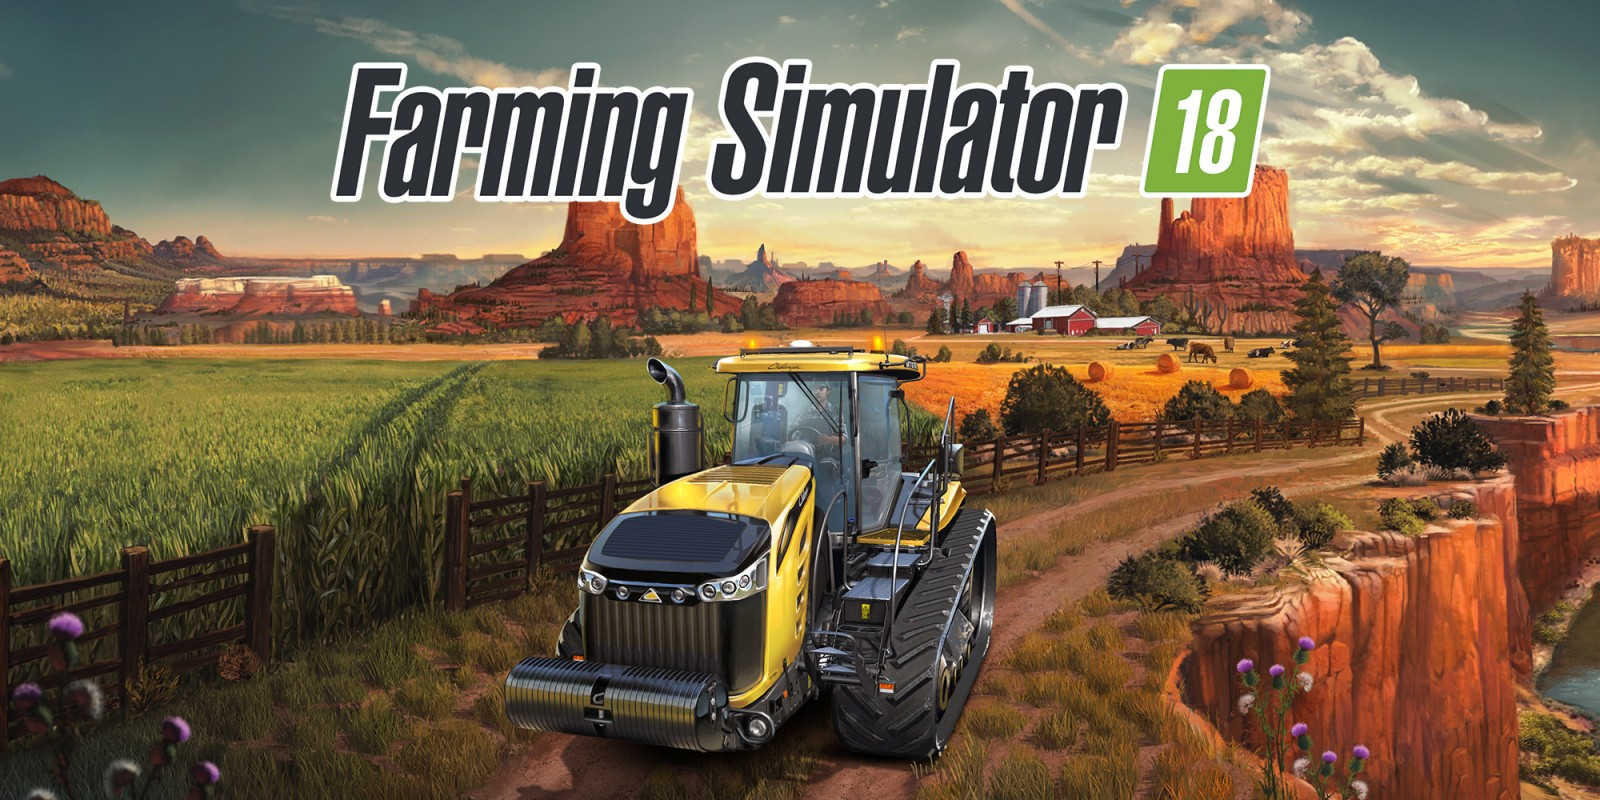 Kids Animal Wallpaper Farming Simulator 18 Nintendo 3ds Games Nintendo